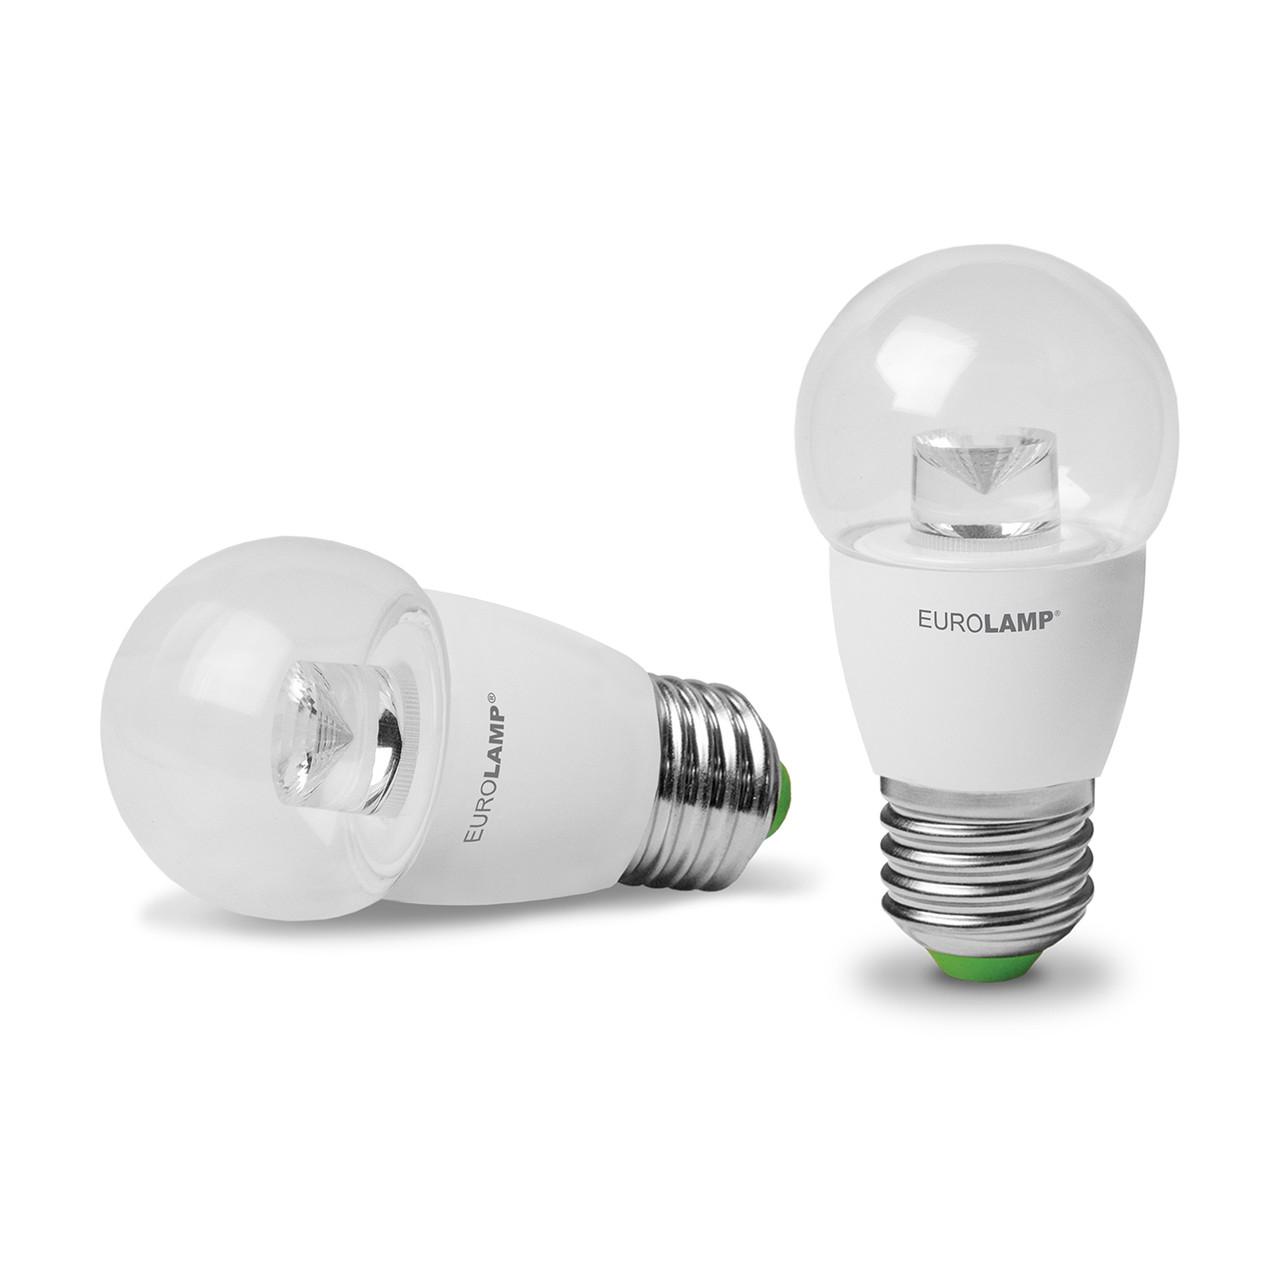 EUROLAMP LED Лампа ЕКО G45 5W E27 4000K(прозрачная)